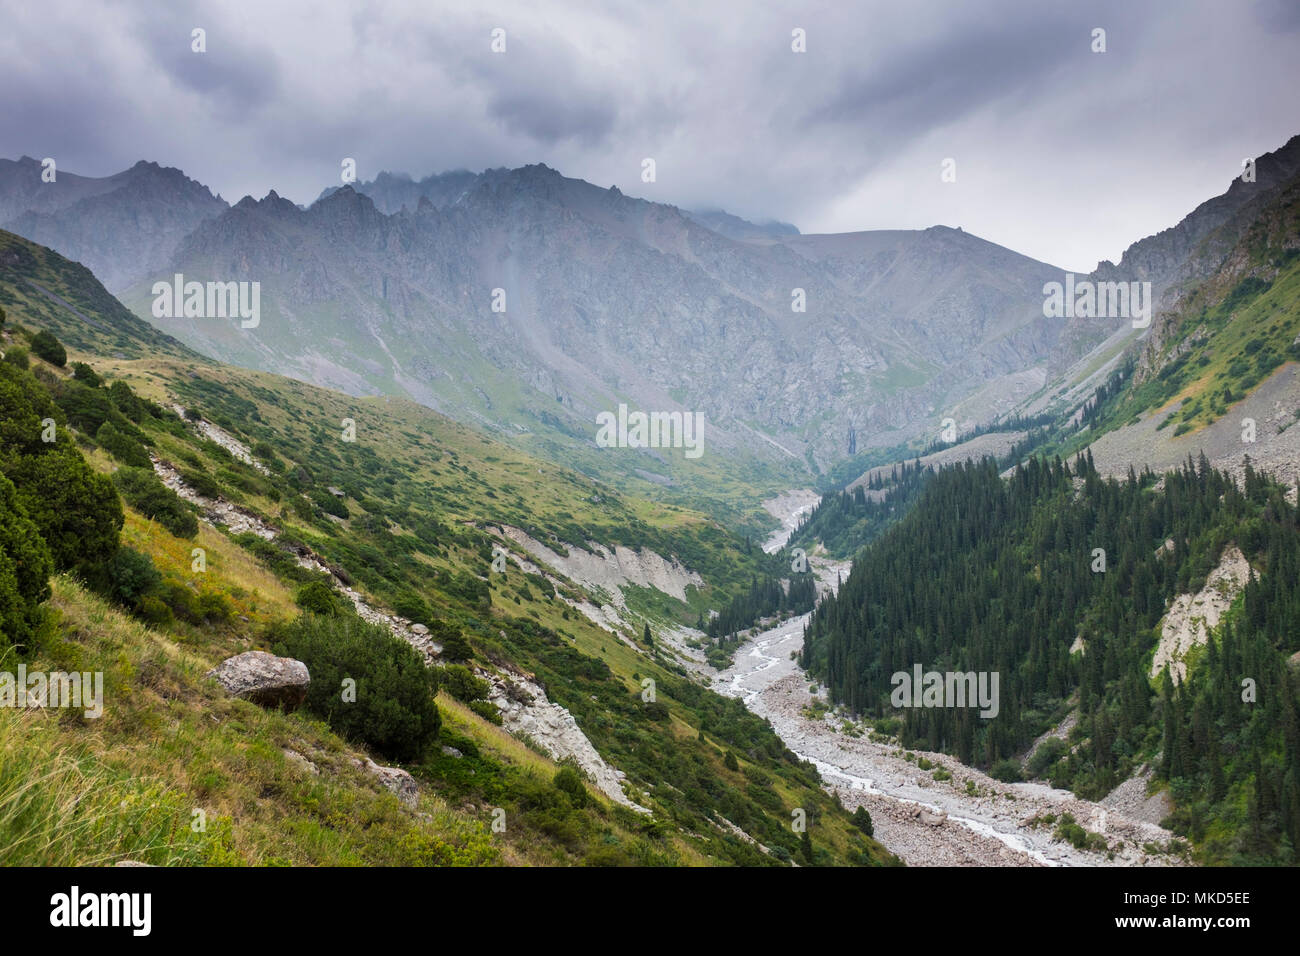 Mountains of Ala Archa National Park under a stormy sky, Bishkek, Kyrgyzstan Stock Photo